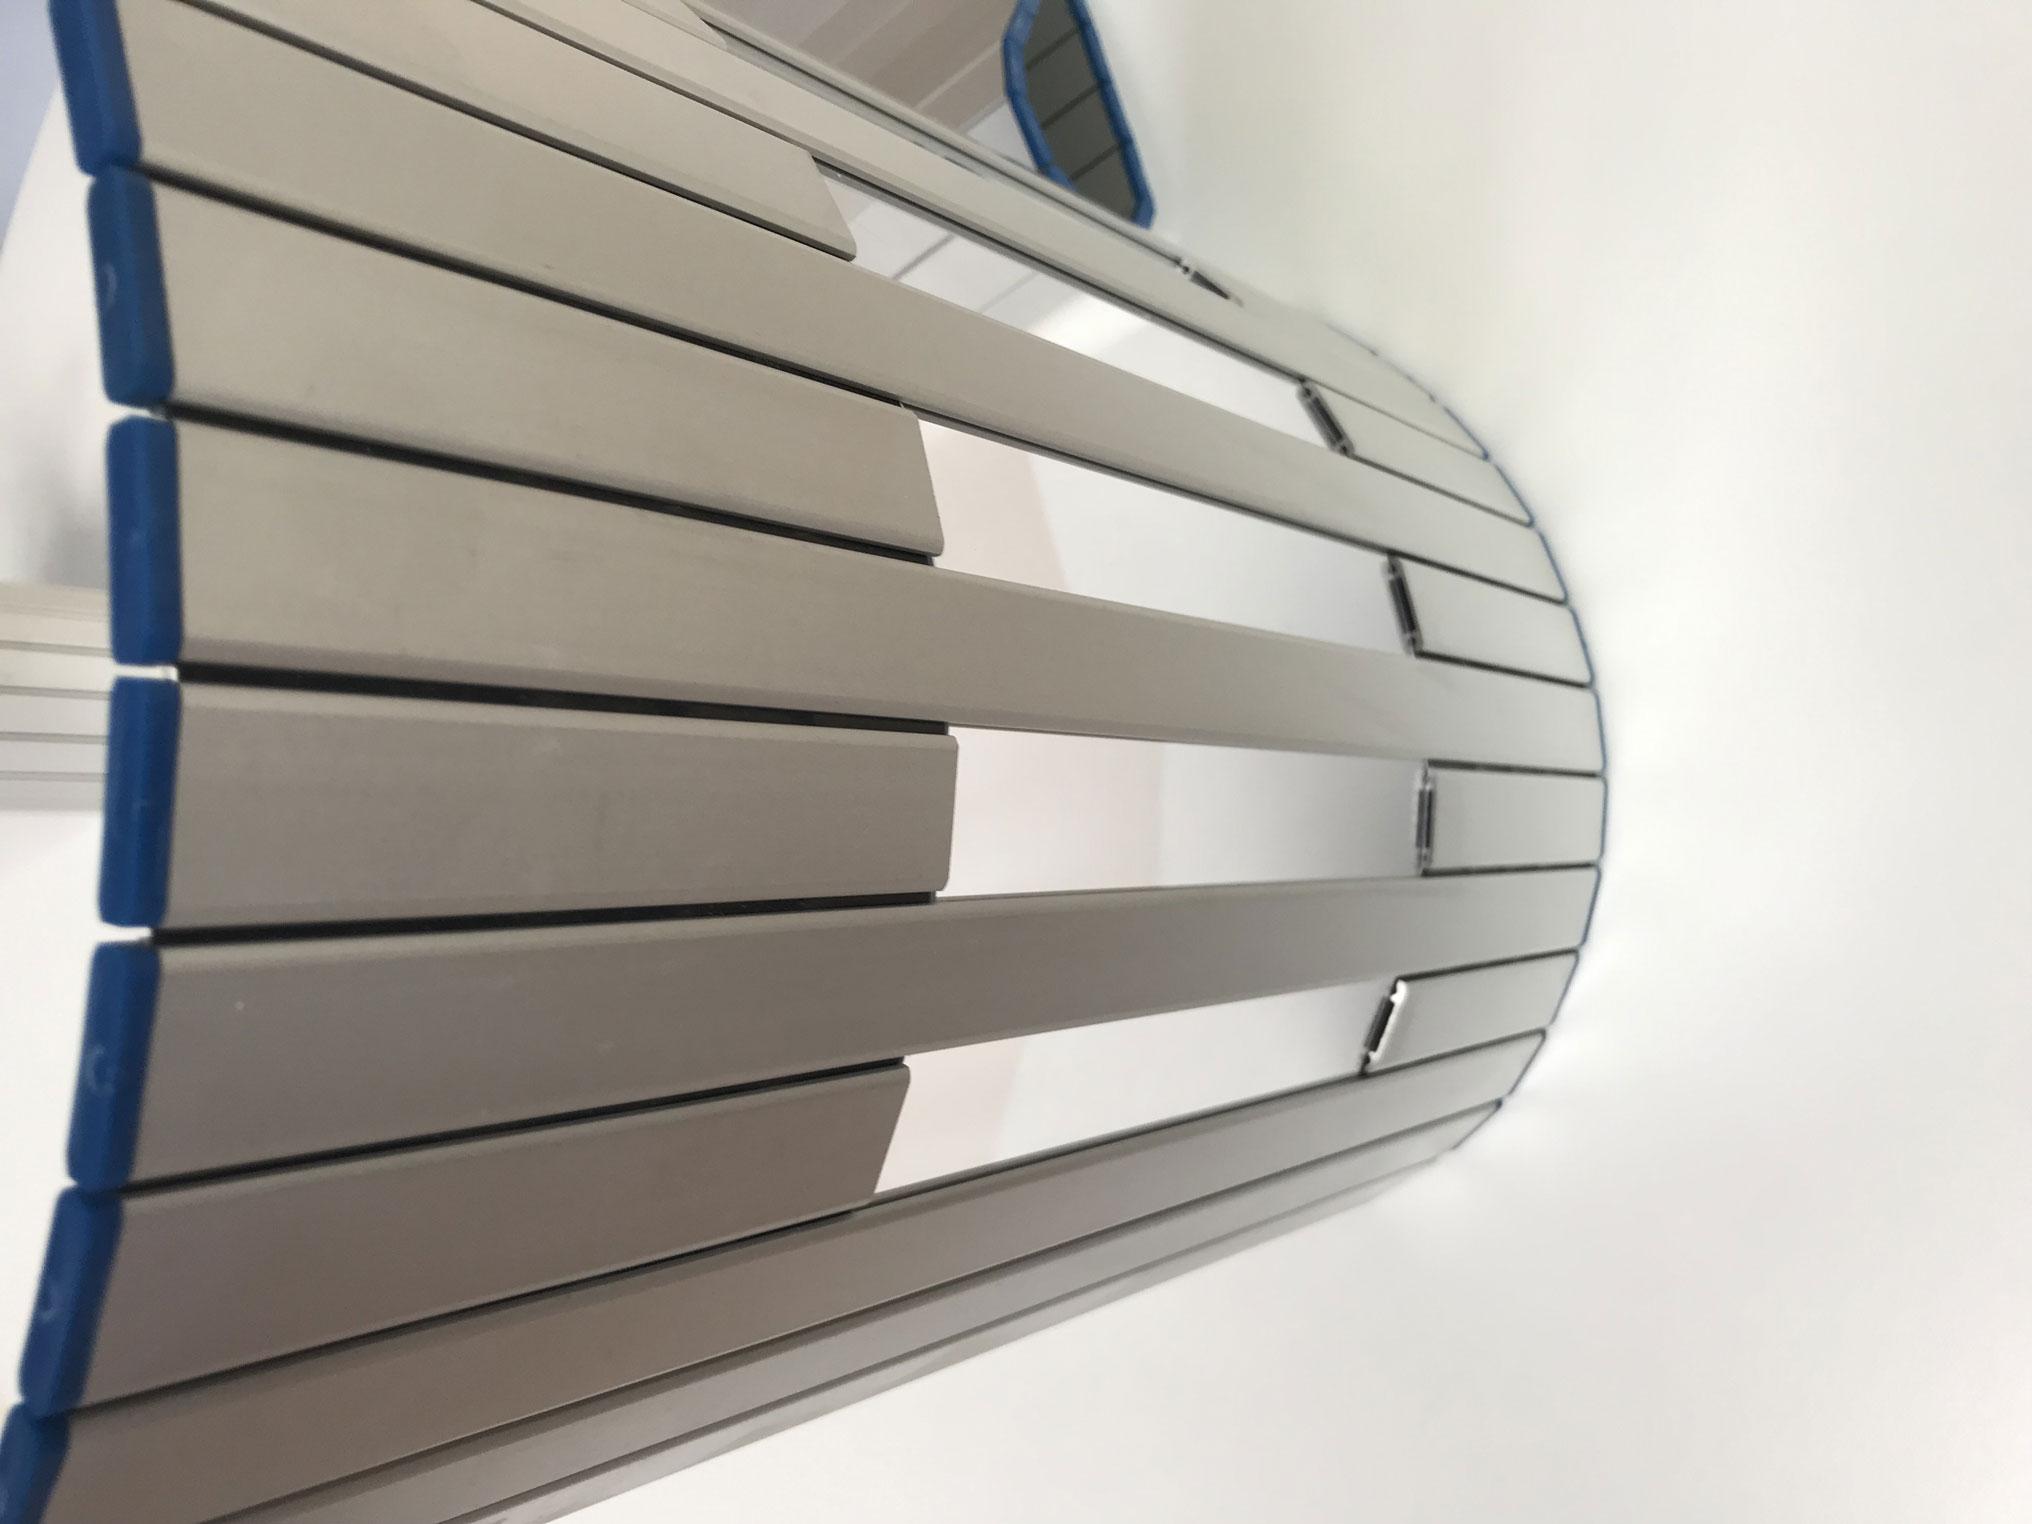 Persianas de protección para máquina modelo PHR con ventana